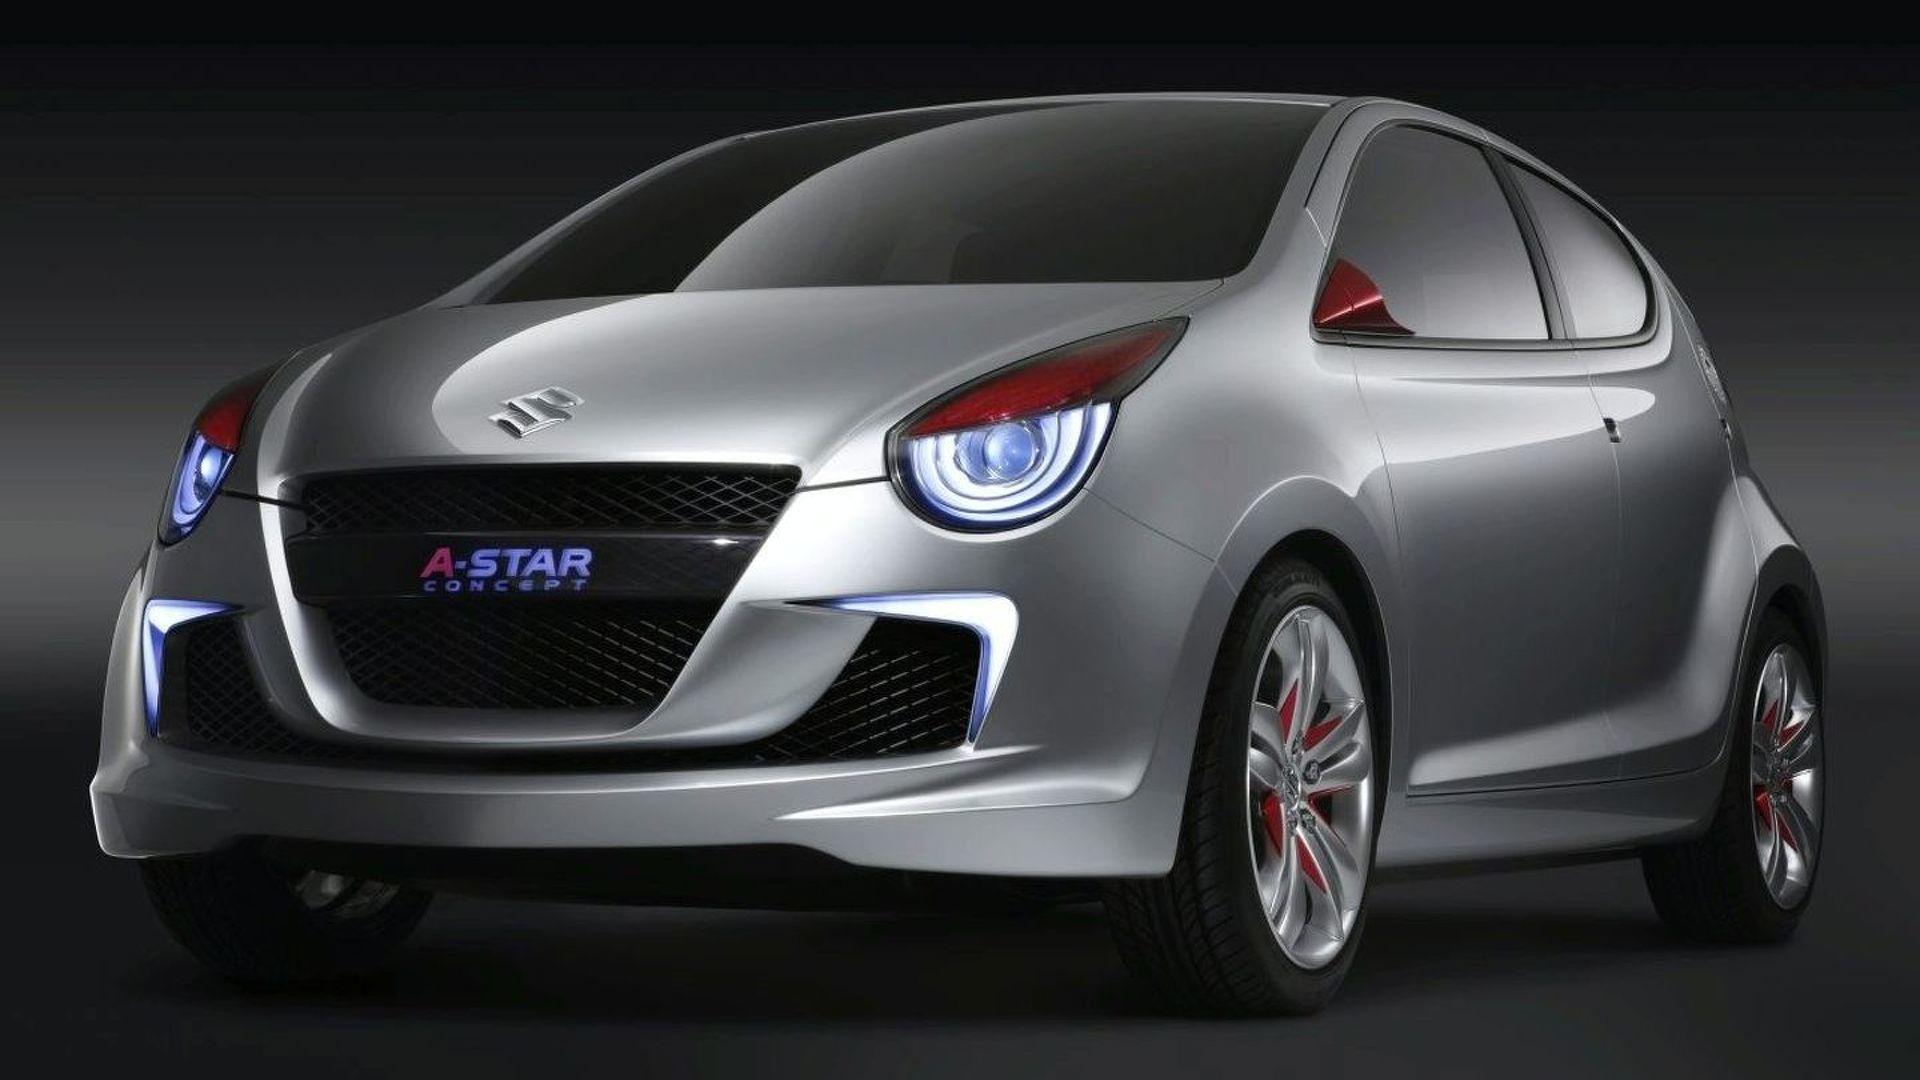 European Debut for Suzuki Concept A-Star at Geneva